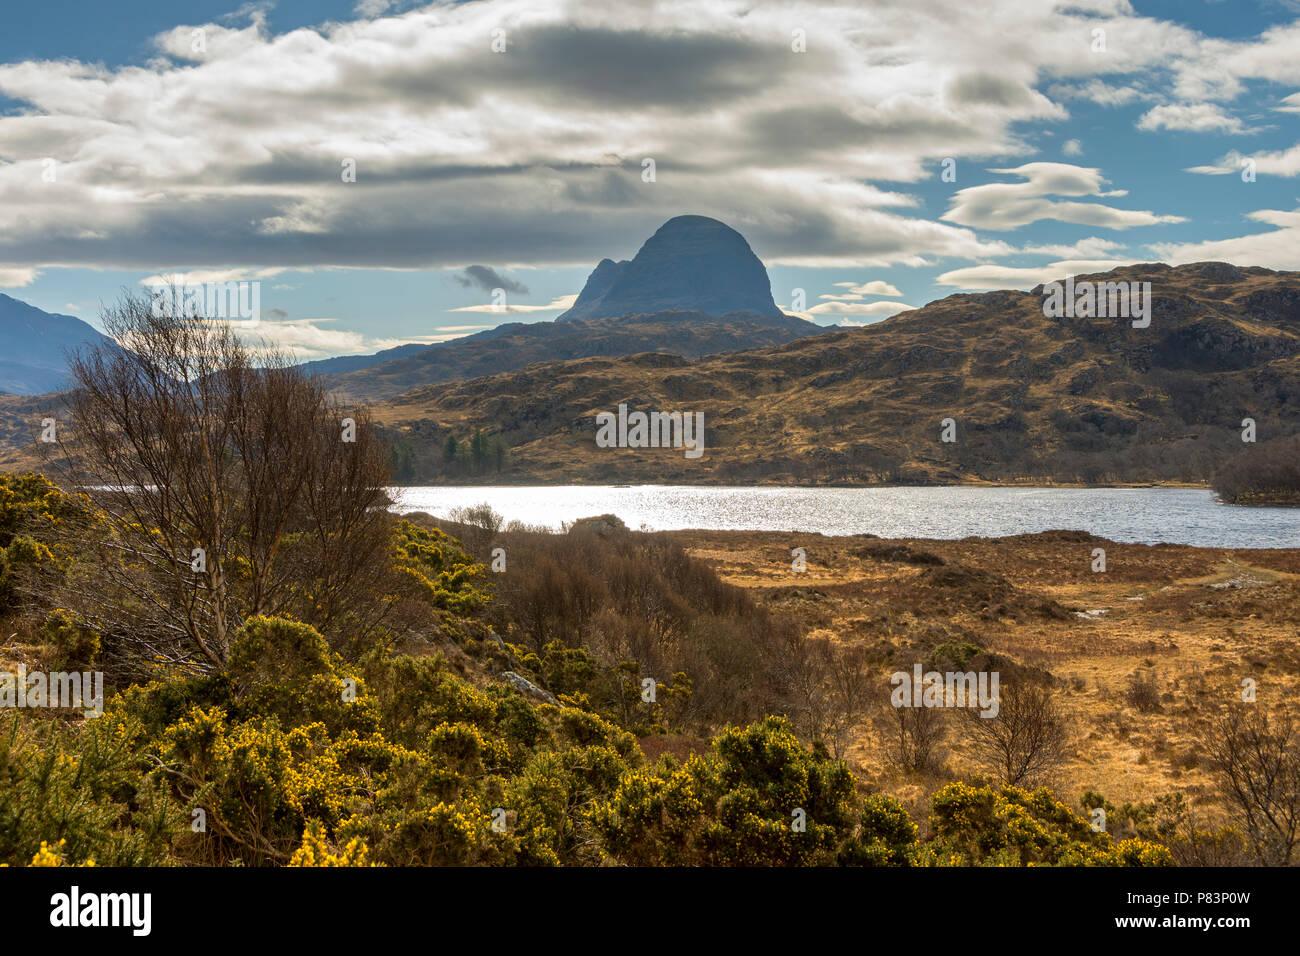 Suilven over Loch Druim Suardalain, Glen Canisp Forest, near Lochinver, Coigach, Sutherland, Highland Region, Scotland, UK Stock Photo